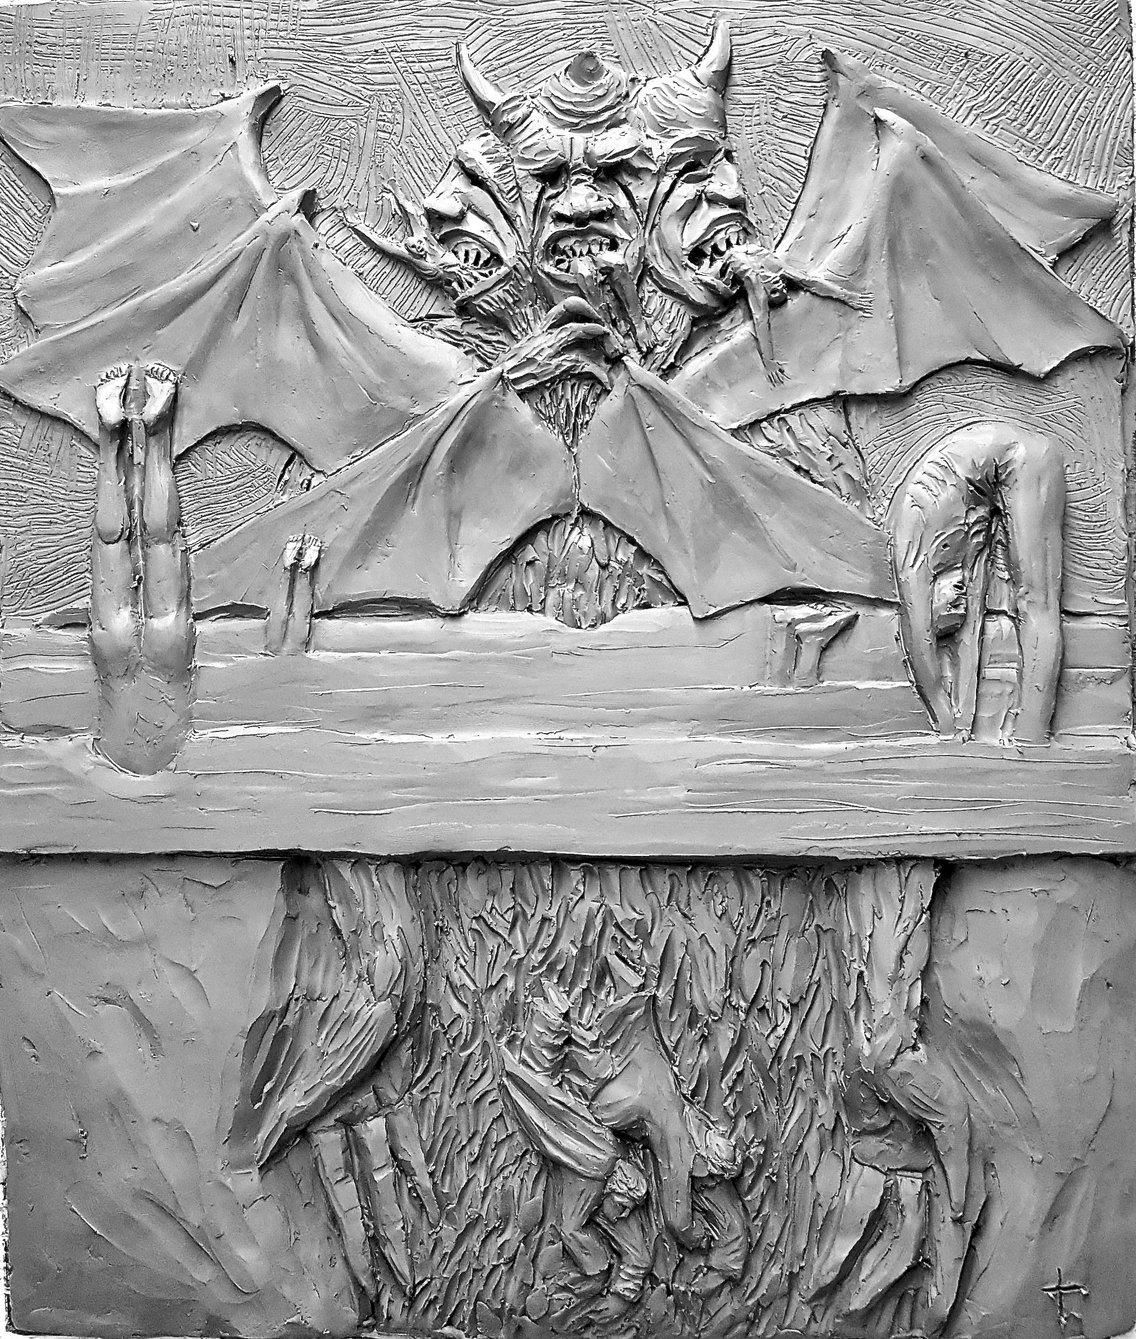 Dante Alighieri's Inferno - immagine di copertina